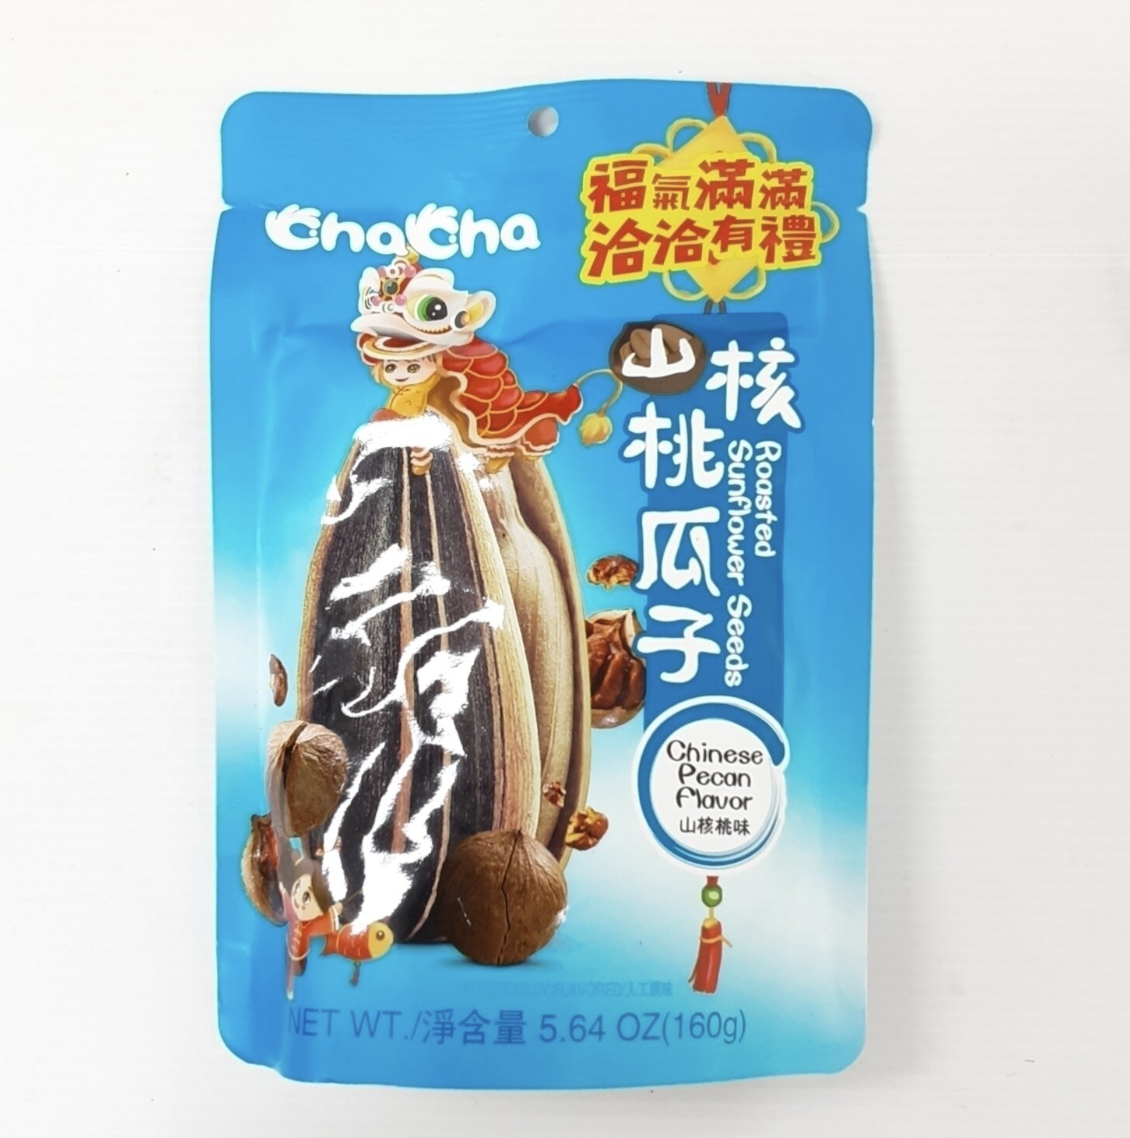 GROC【杂货】恰恰 山核桃瓜子 山核桃味 ~160g(5.65oz)